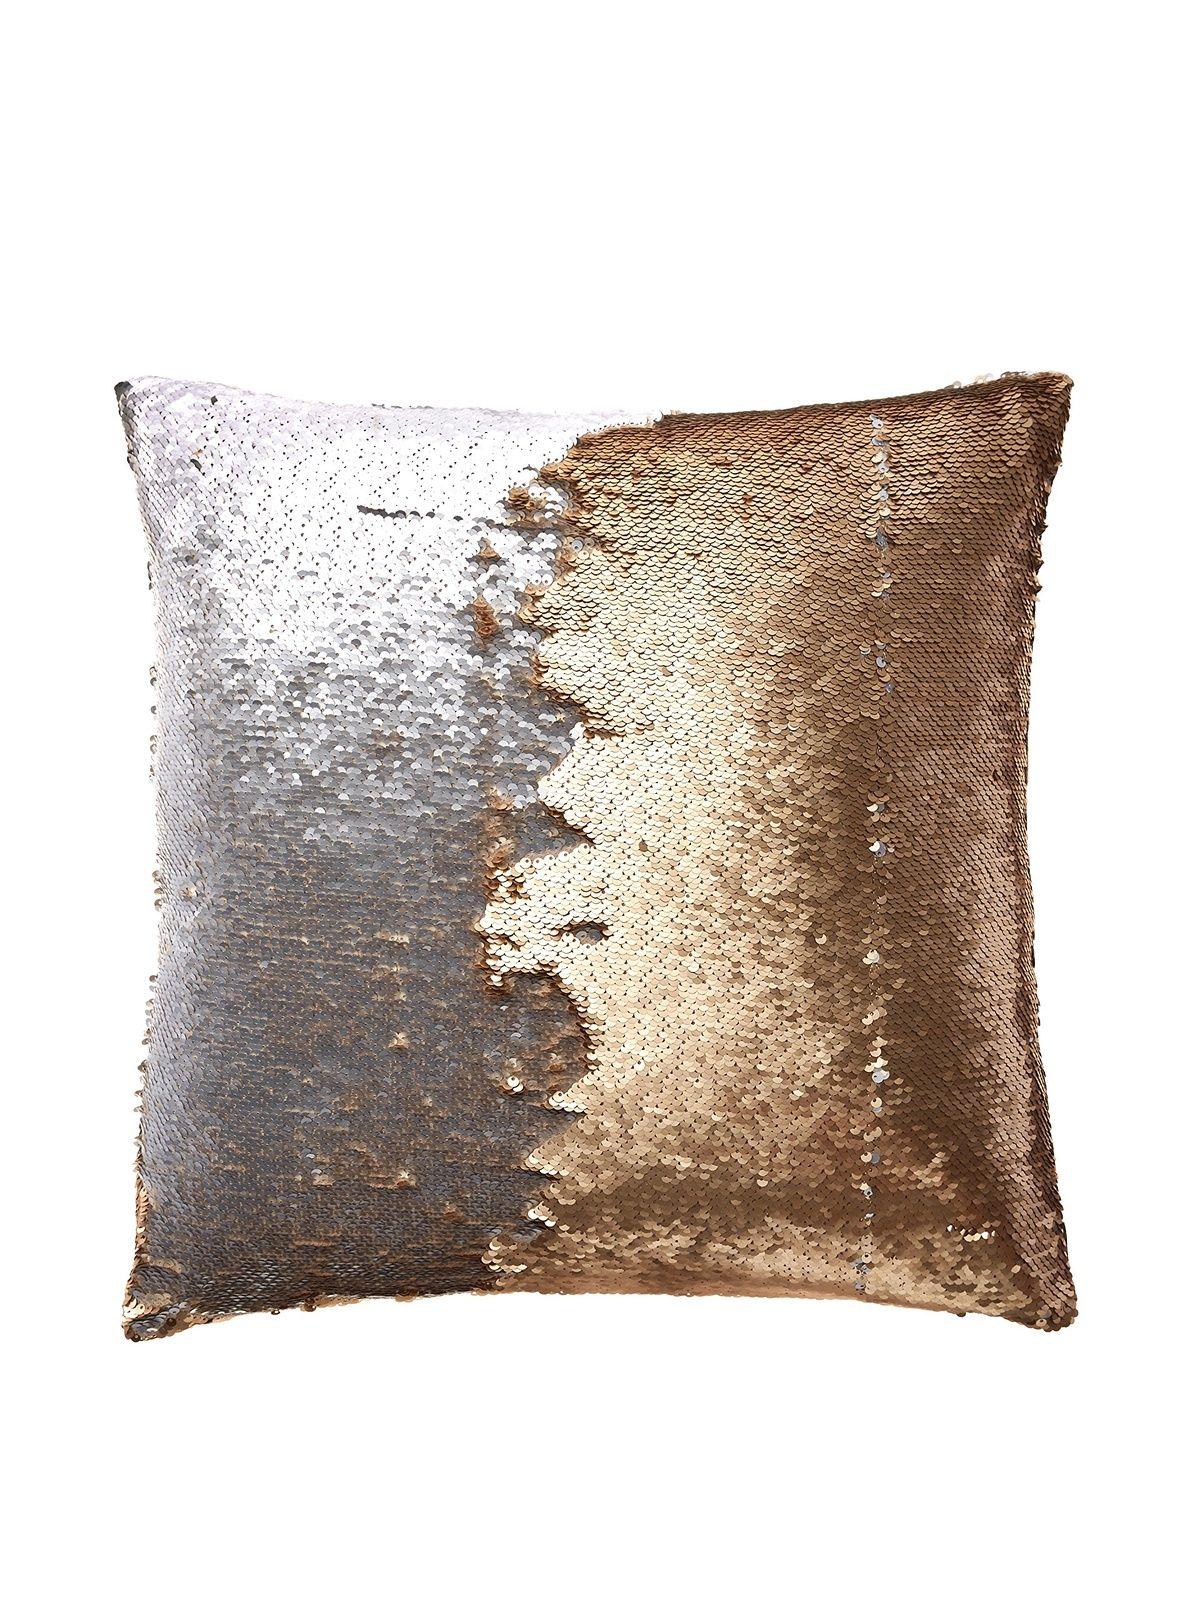 New Mermaid Sequin Pillow in Citrine 20x20 | Home/room | Pinterest  DN71